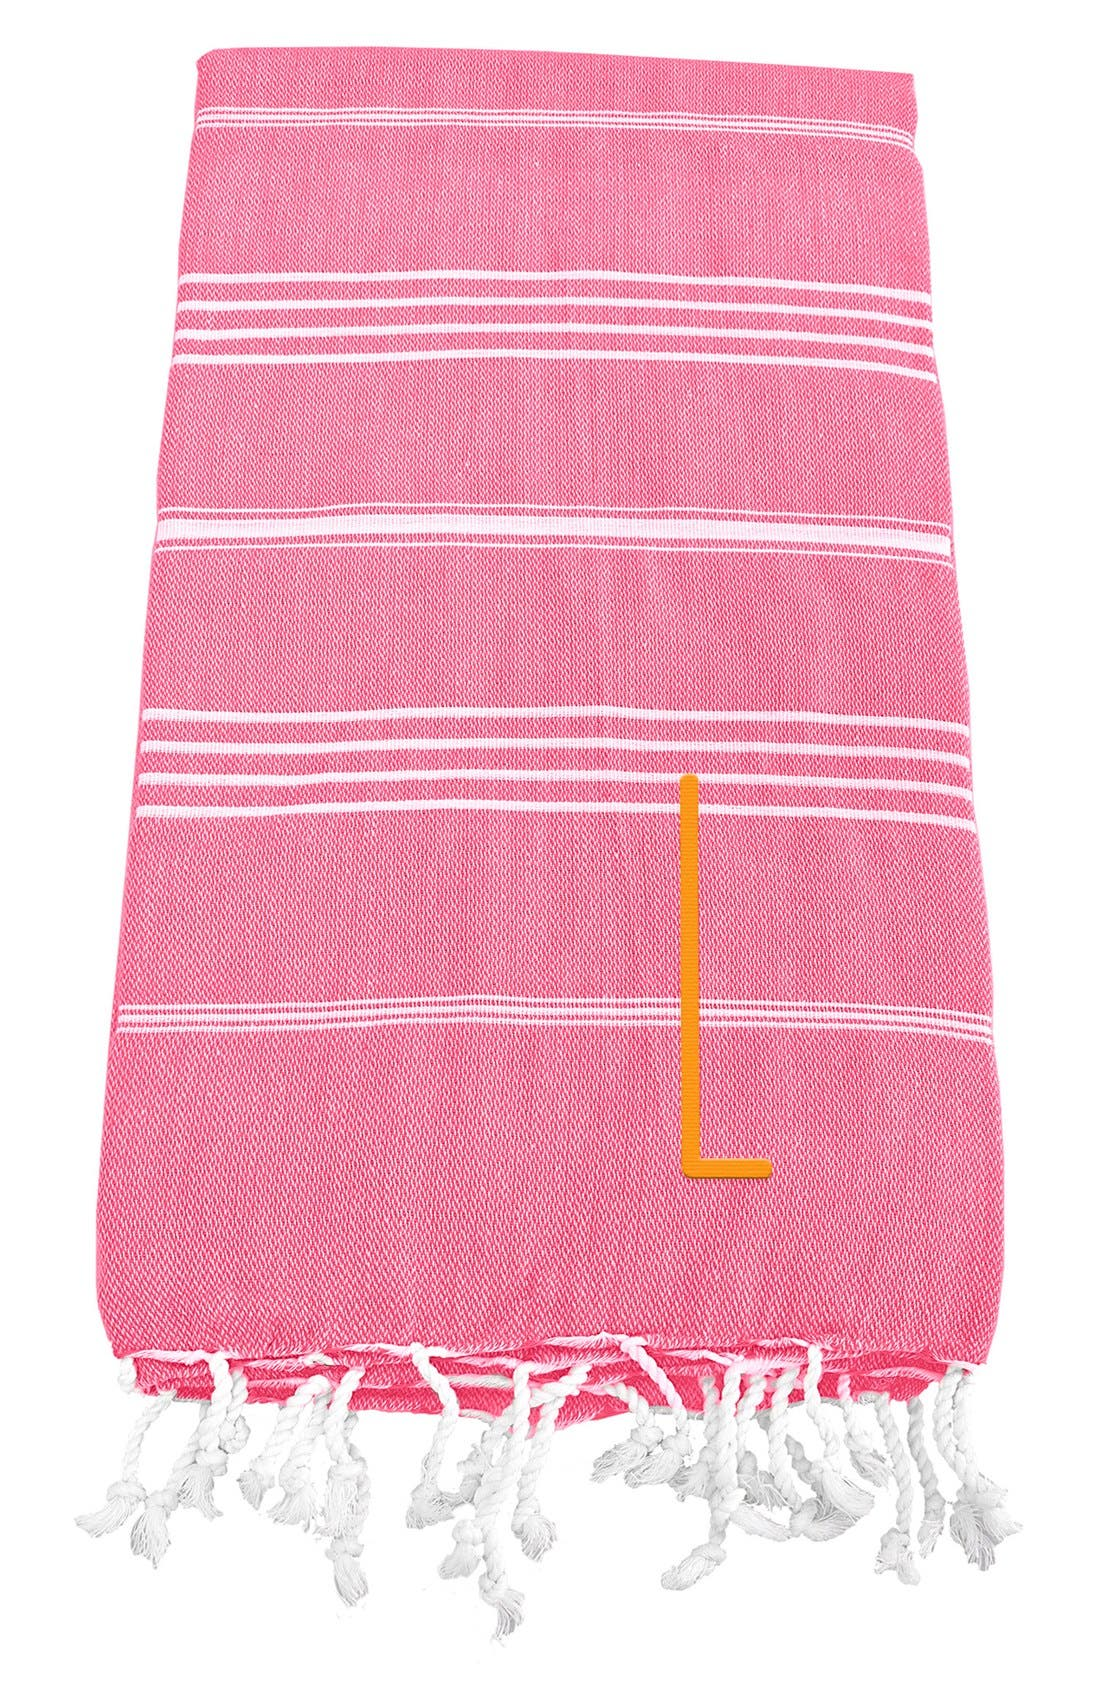 Monogram Turkish Cotton Towel,                             Main thumbnail 148, color,